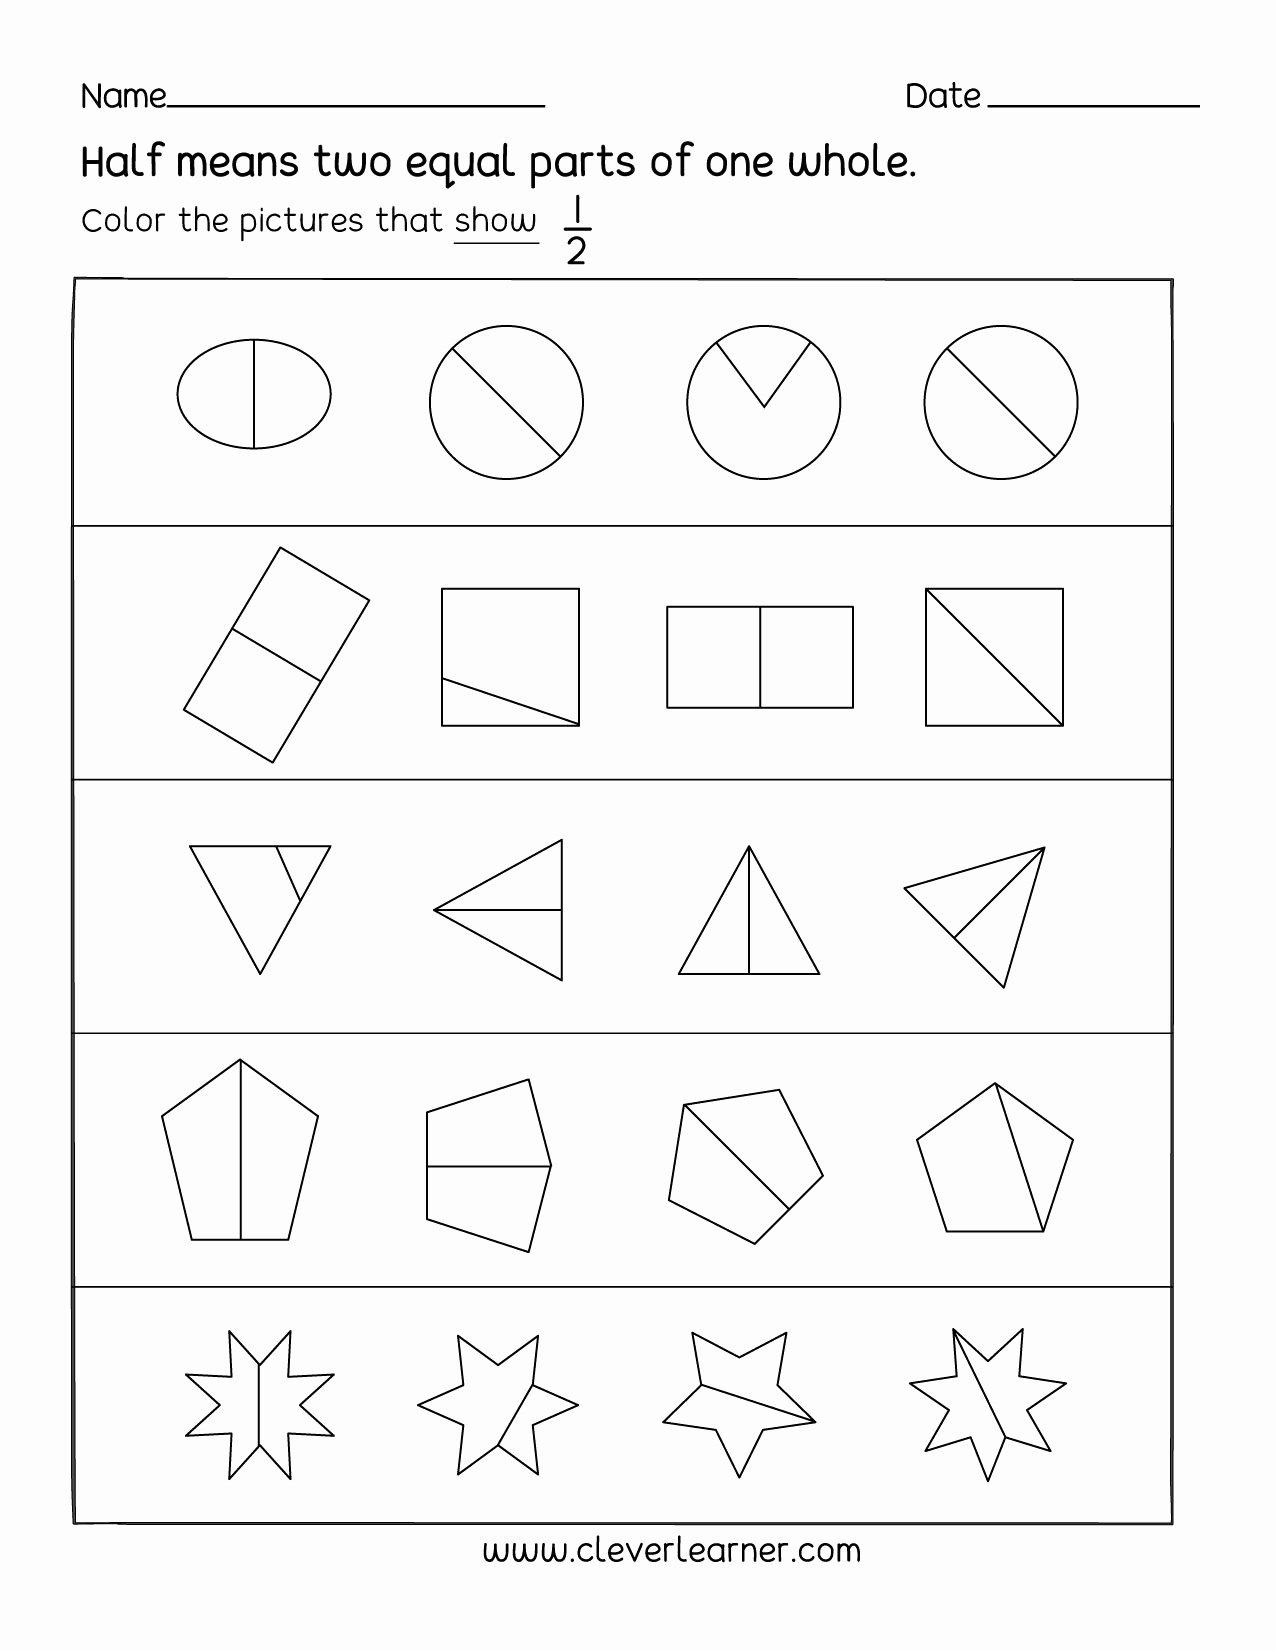 Activity Worksheets for Preschoolers Lovely Fun Activity On Fractions Half 1 2 Worksheets for Children